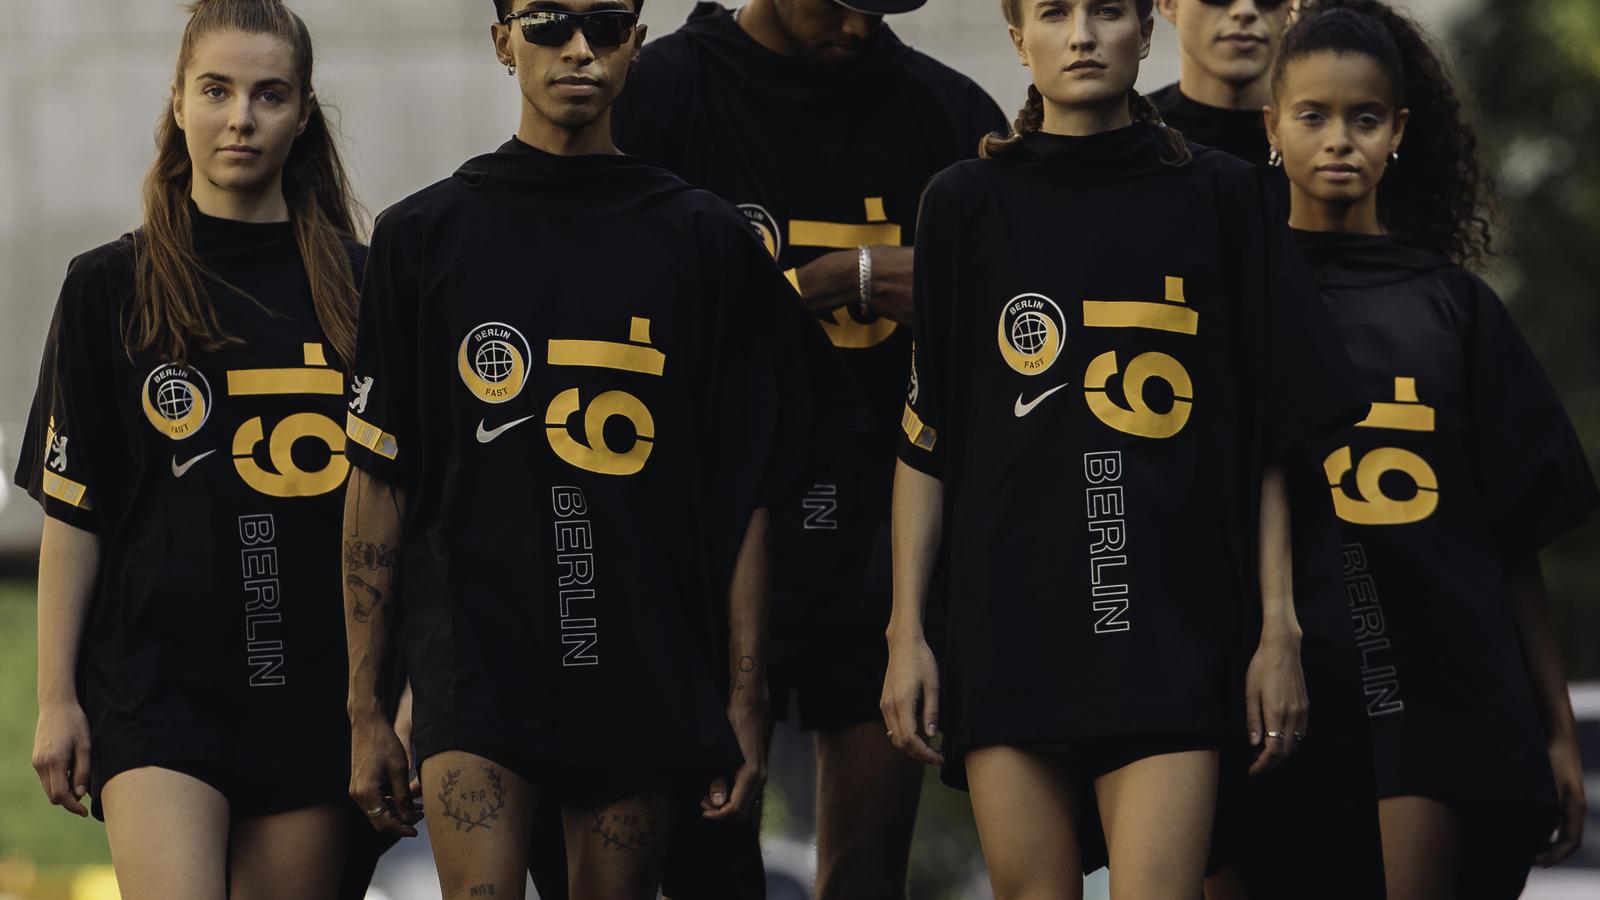 nike-apparel-berlin-marathon-fast-capsule-collection